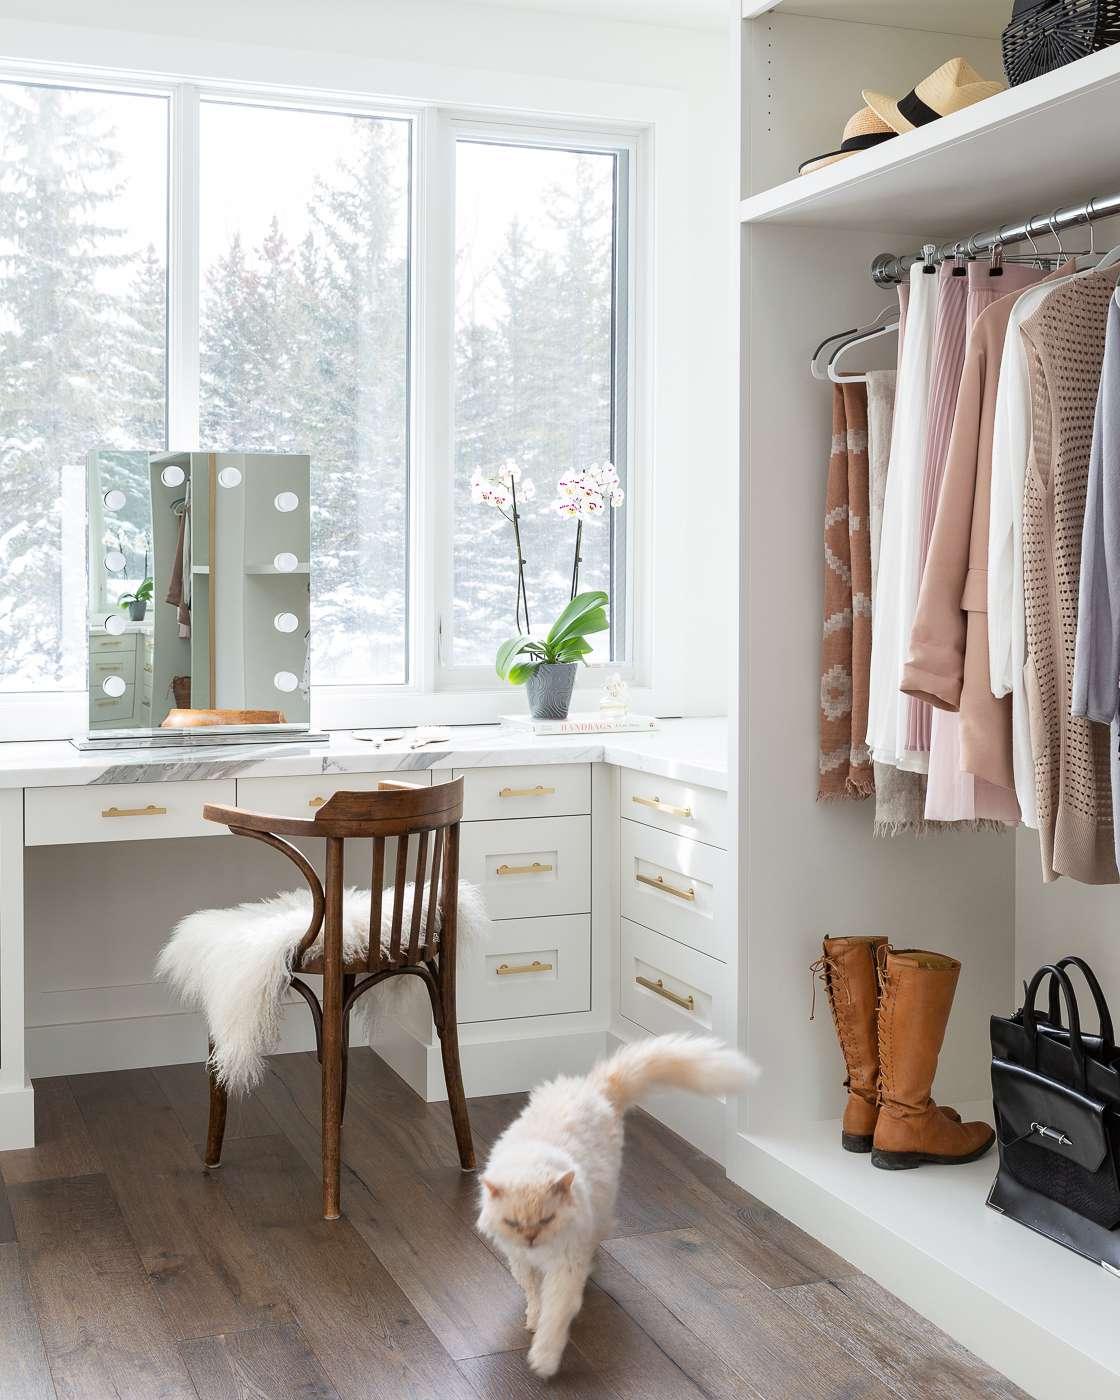 Closet with vanity station